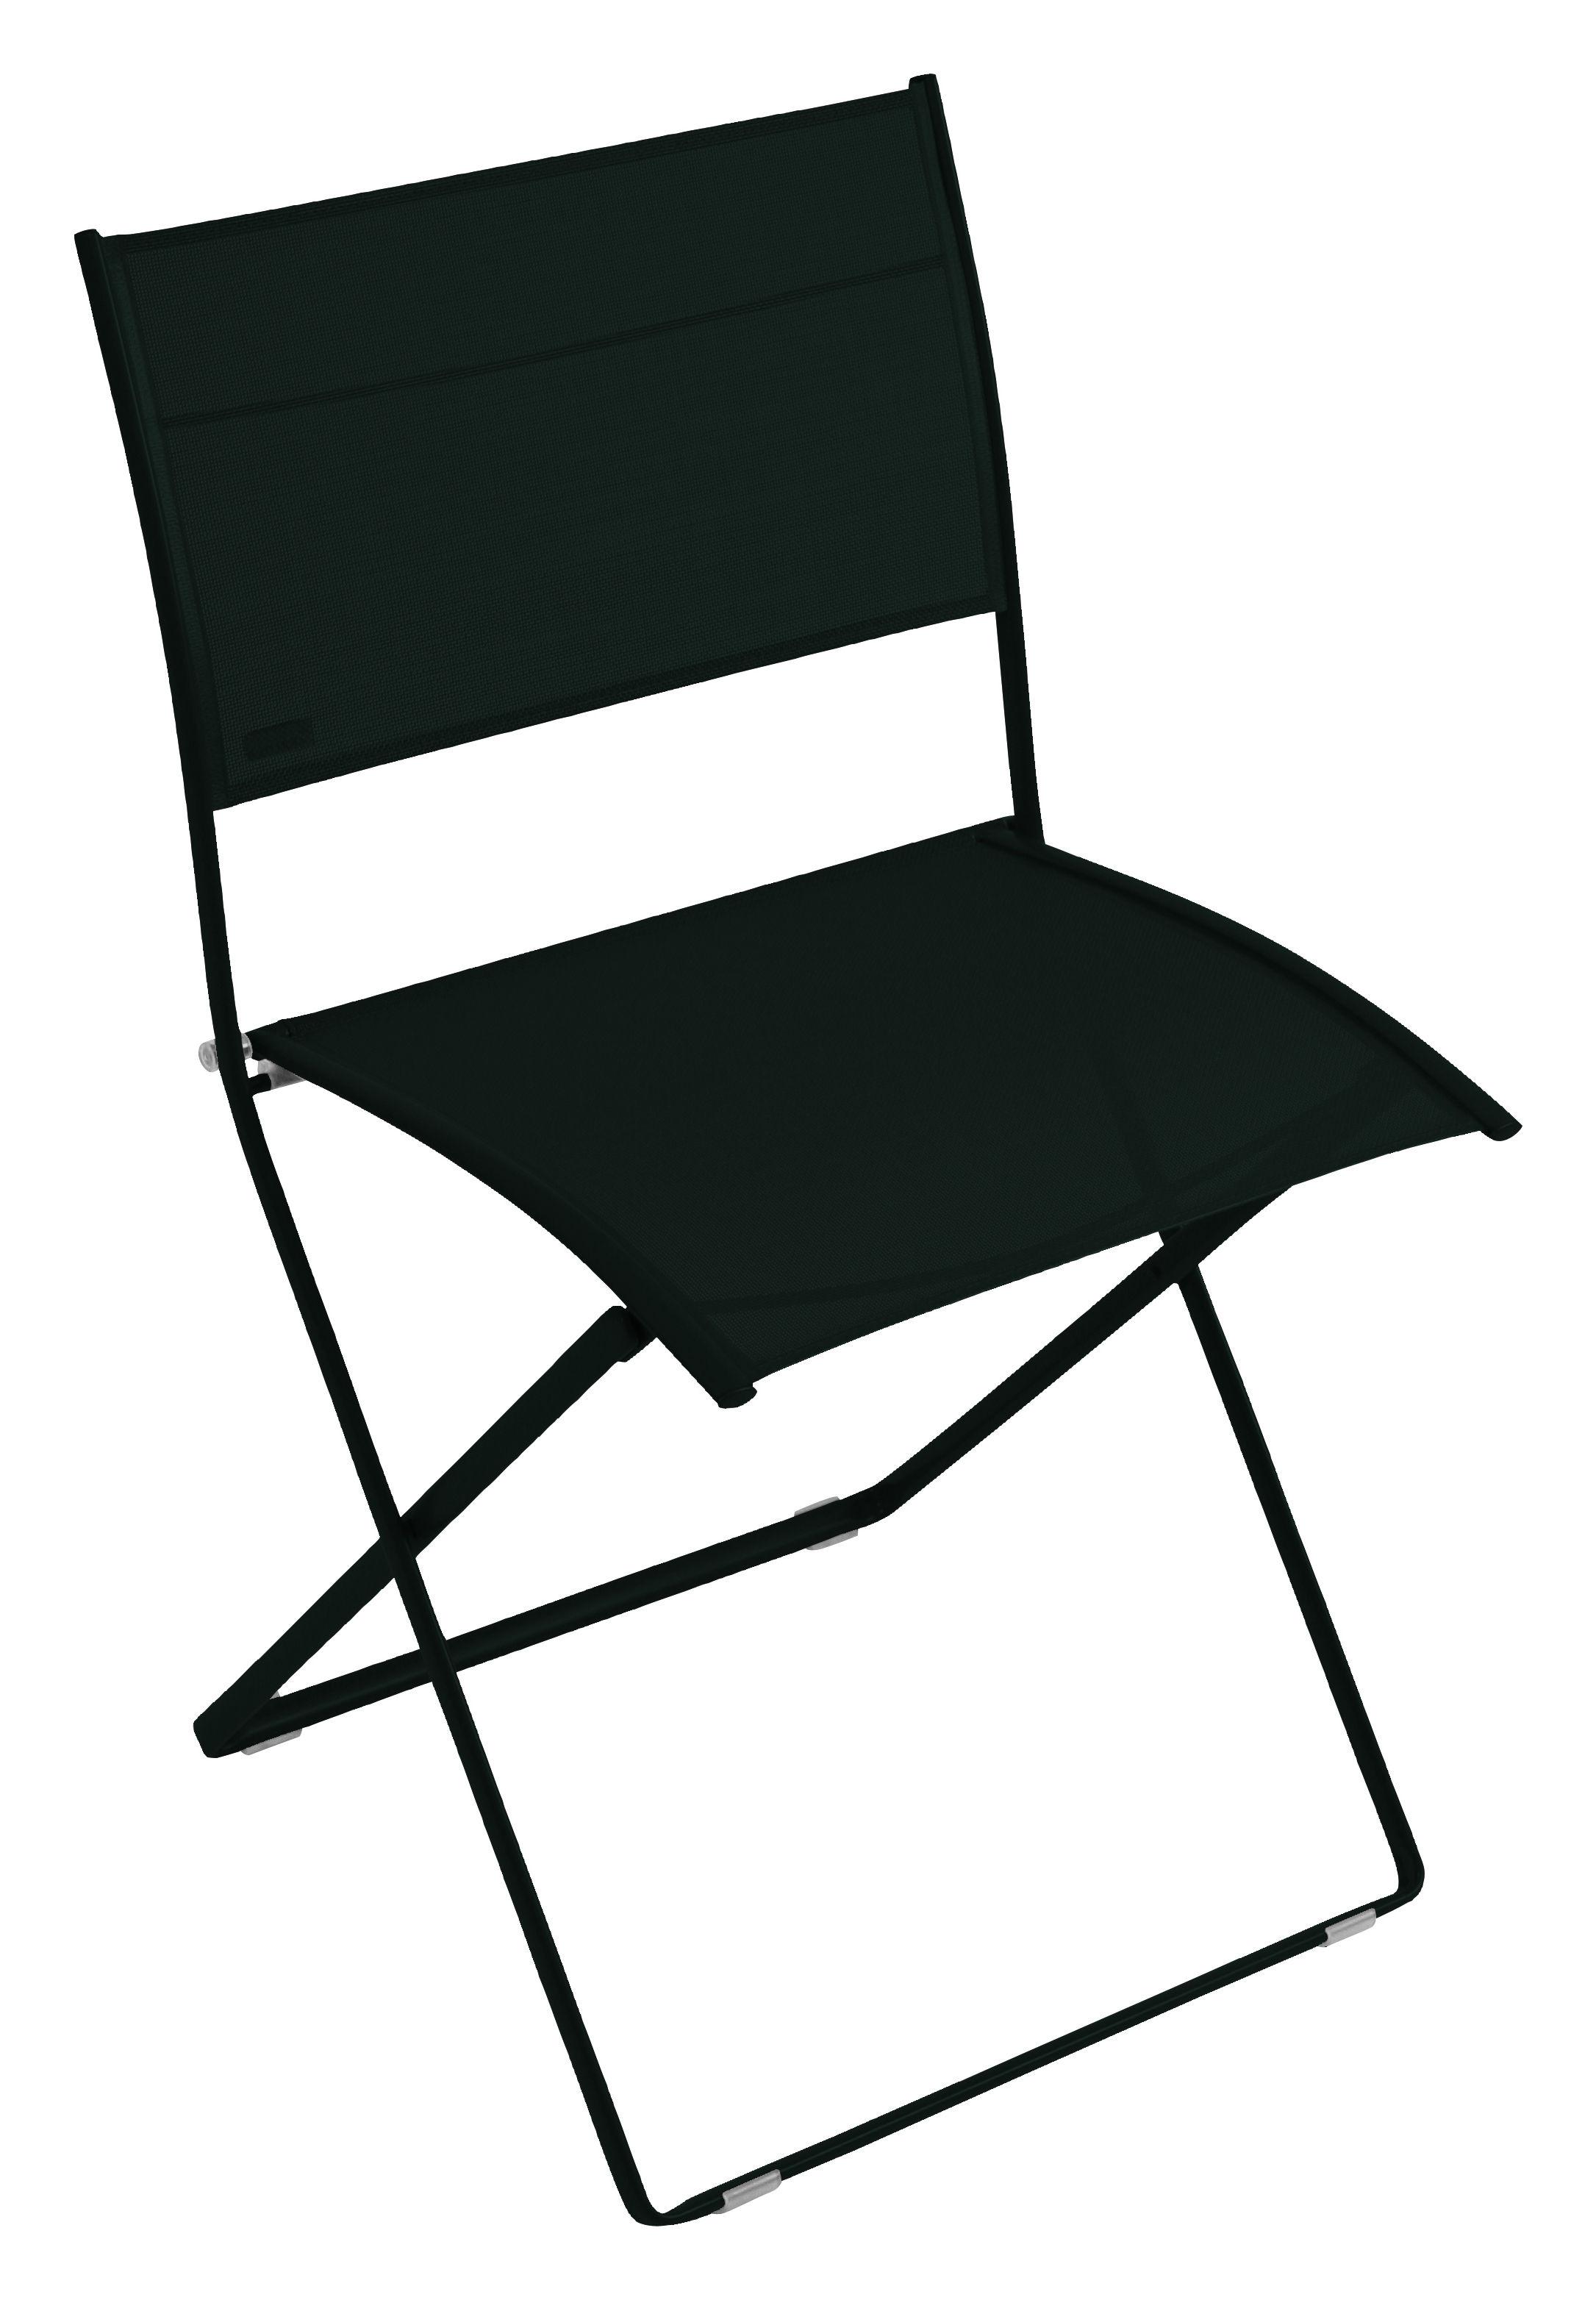 chaise pliante plein air toile r glisse fermob. Black Bedroom Furniture Sets. Home Design Ideas